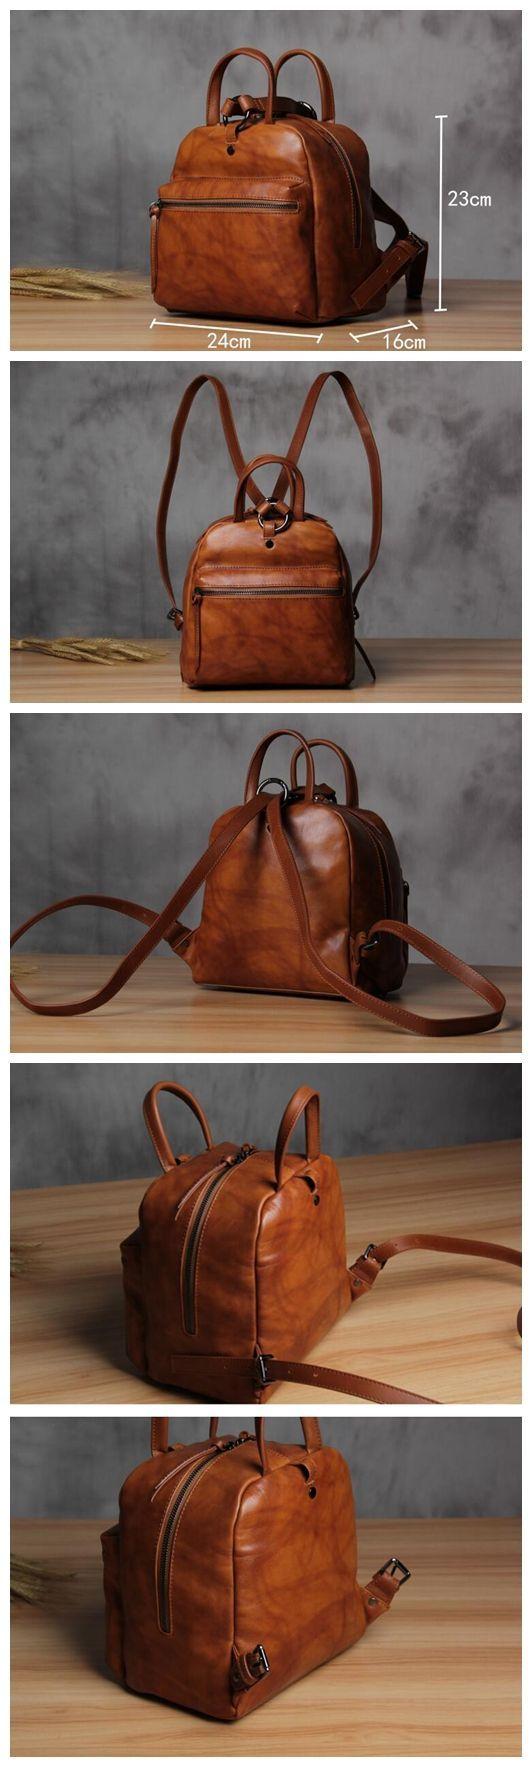 Genuine Leather School Backpack Casual Rucksack Travel Backpack Daily Bag 14123